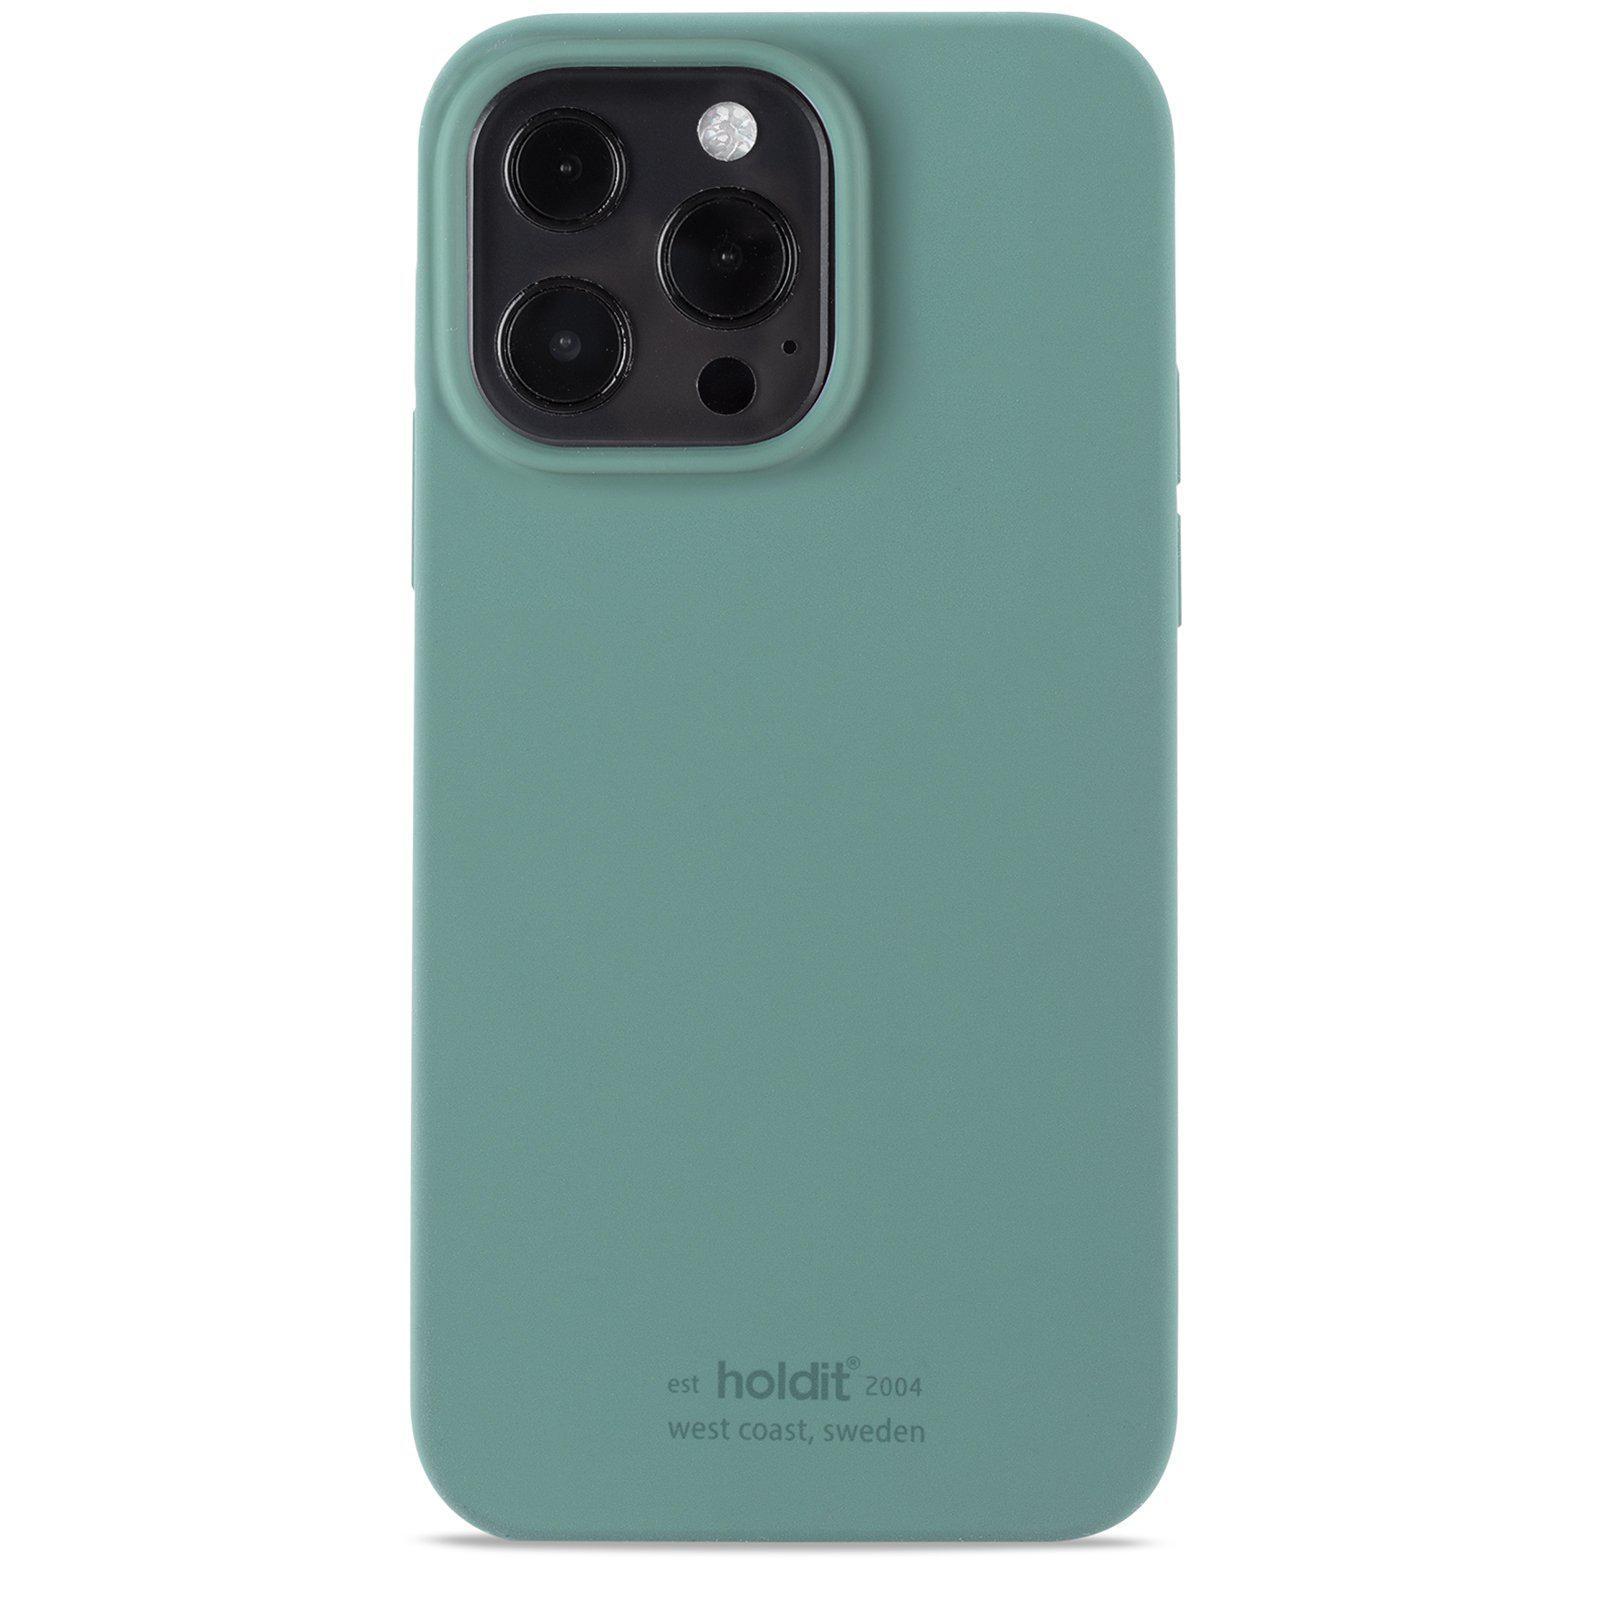 Silikonikuori iPhone 13 Pro Max Moss Green